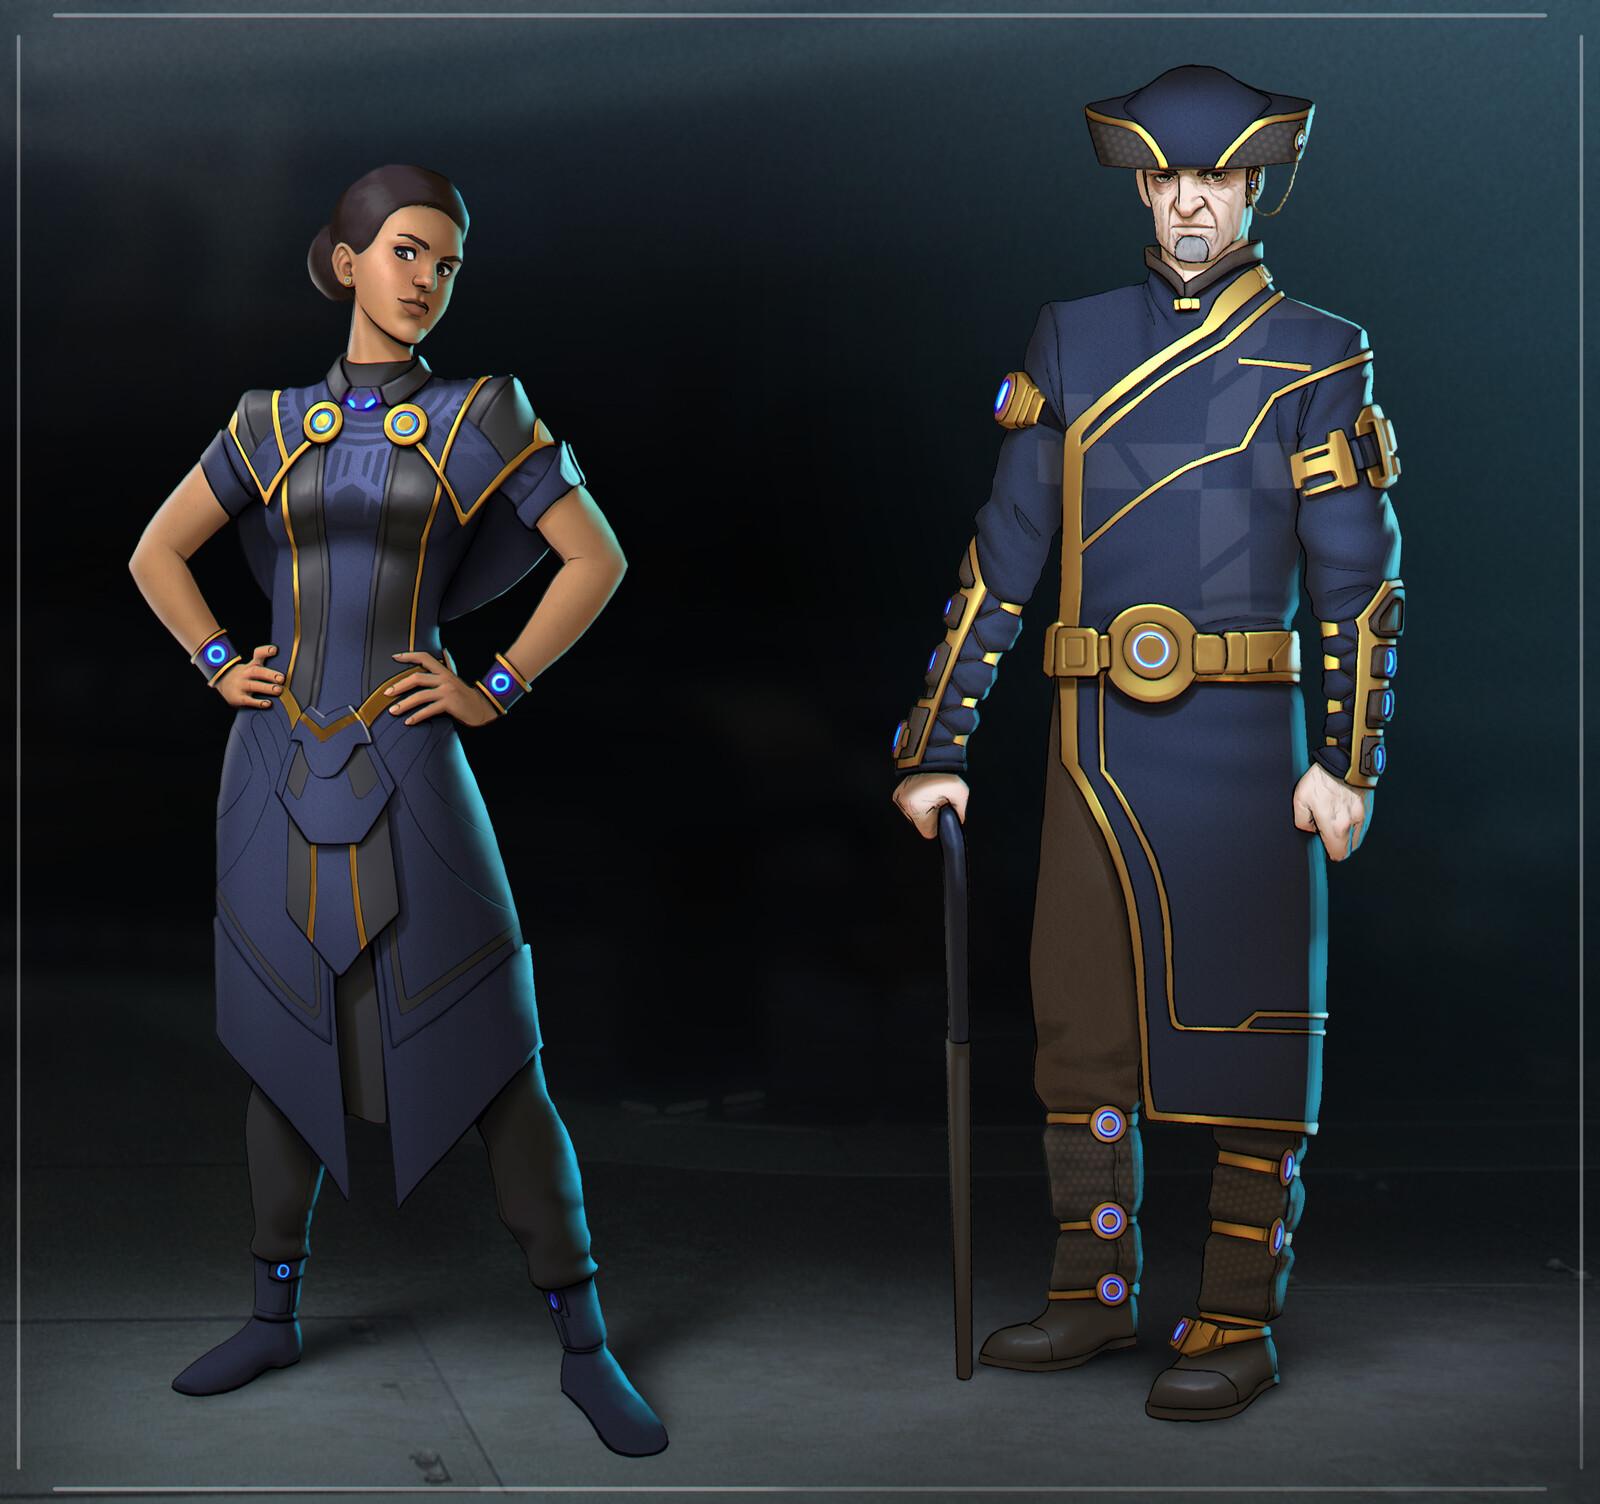 Starship Crew Uniforms